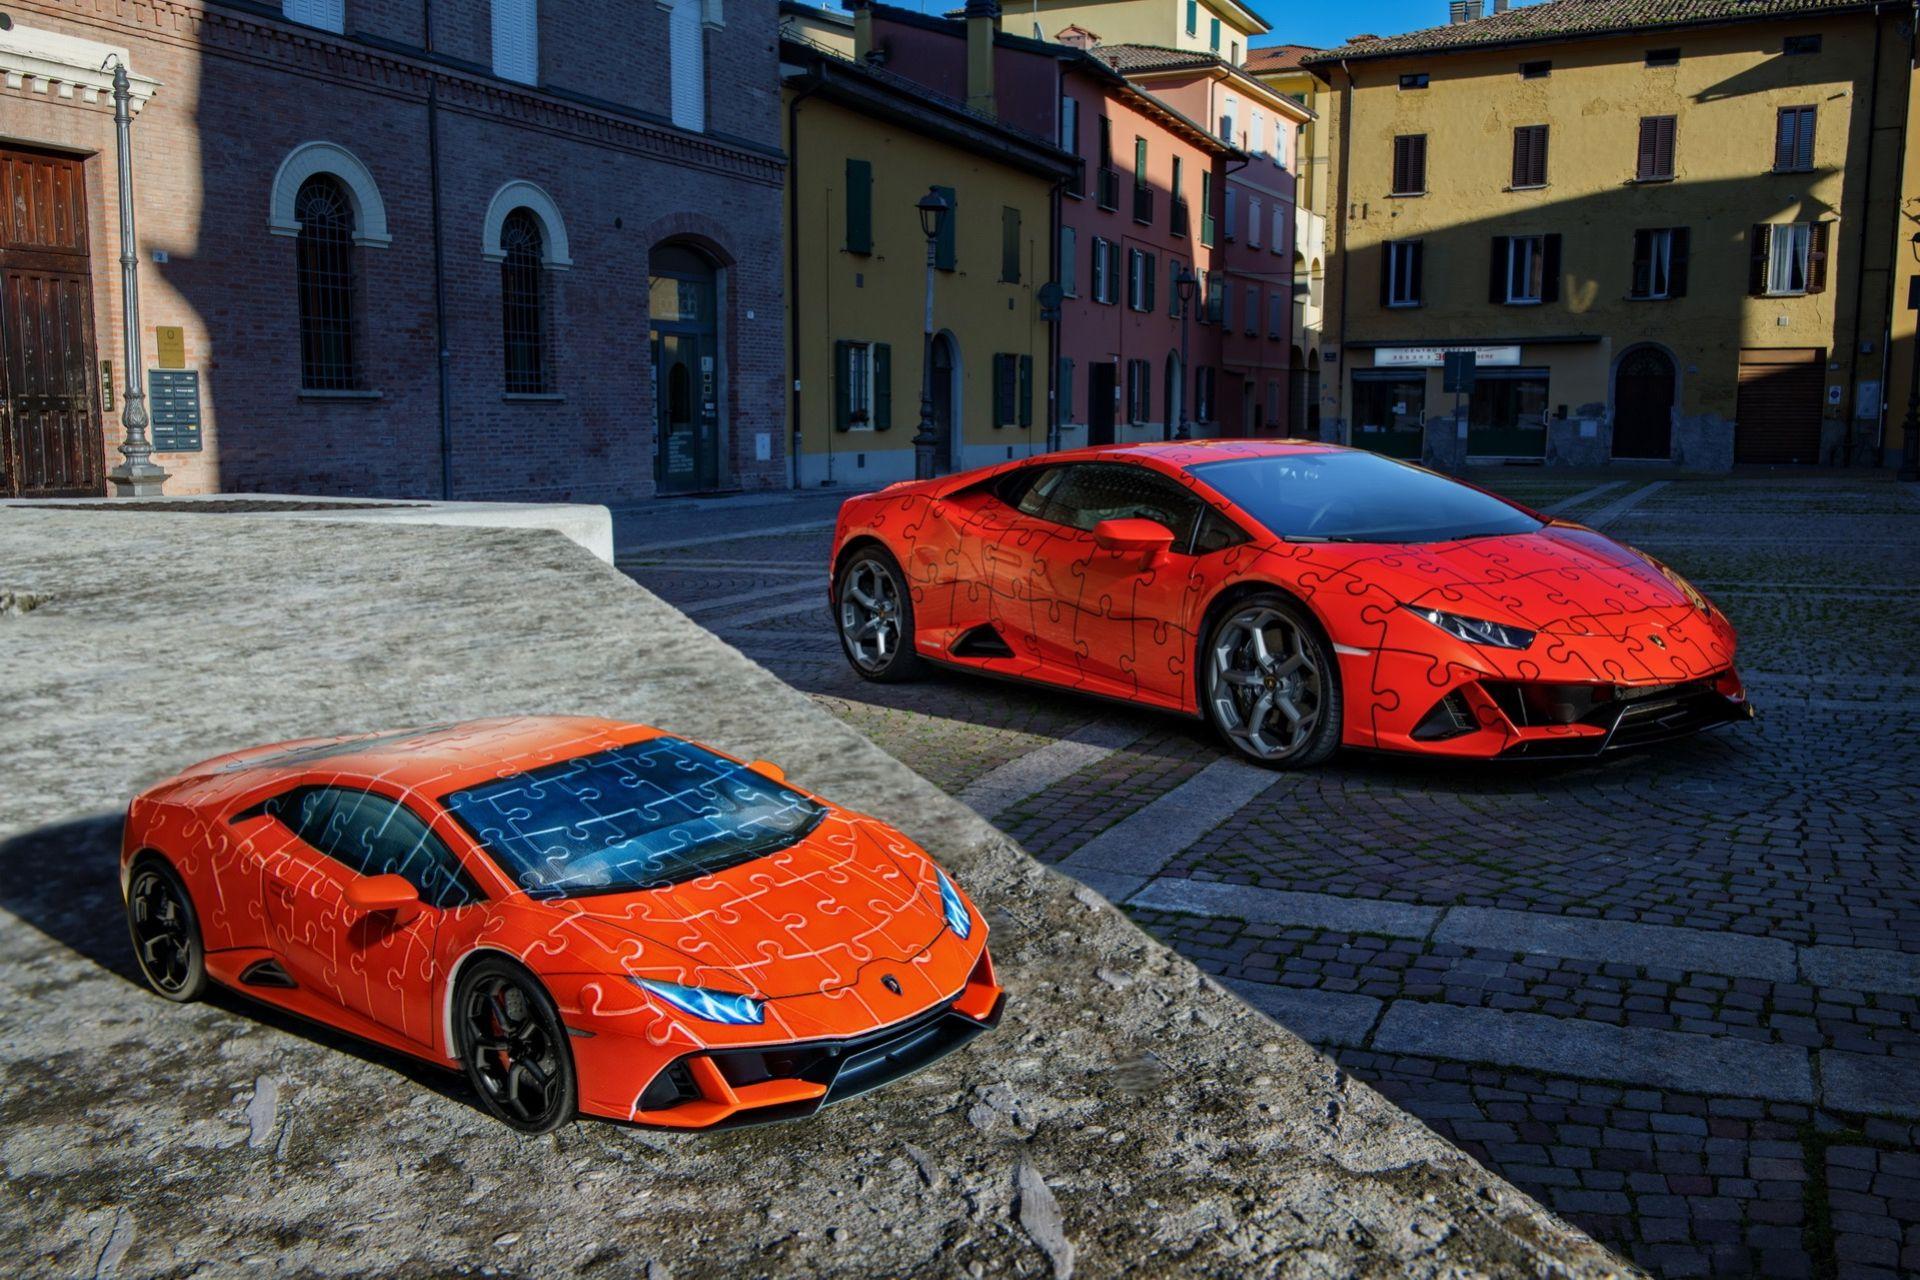 Bygg dig en egen Lamborghini Huracán Evo